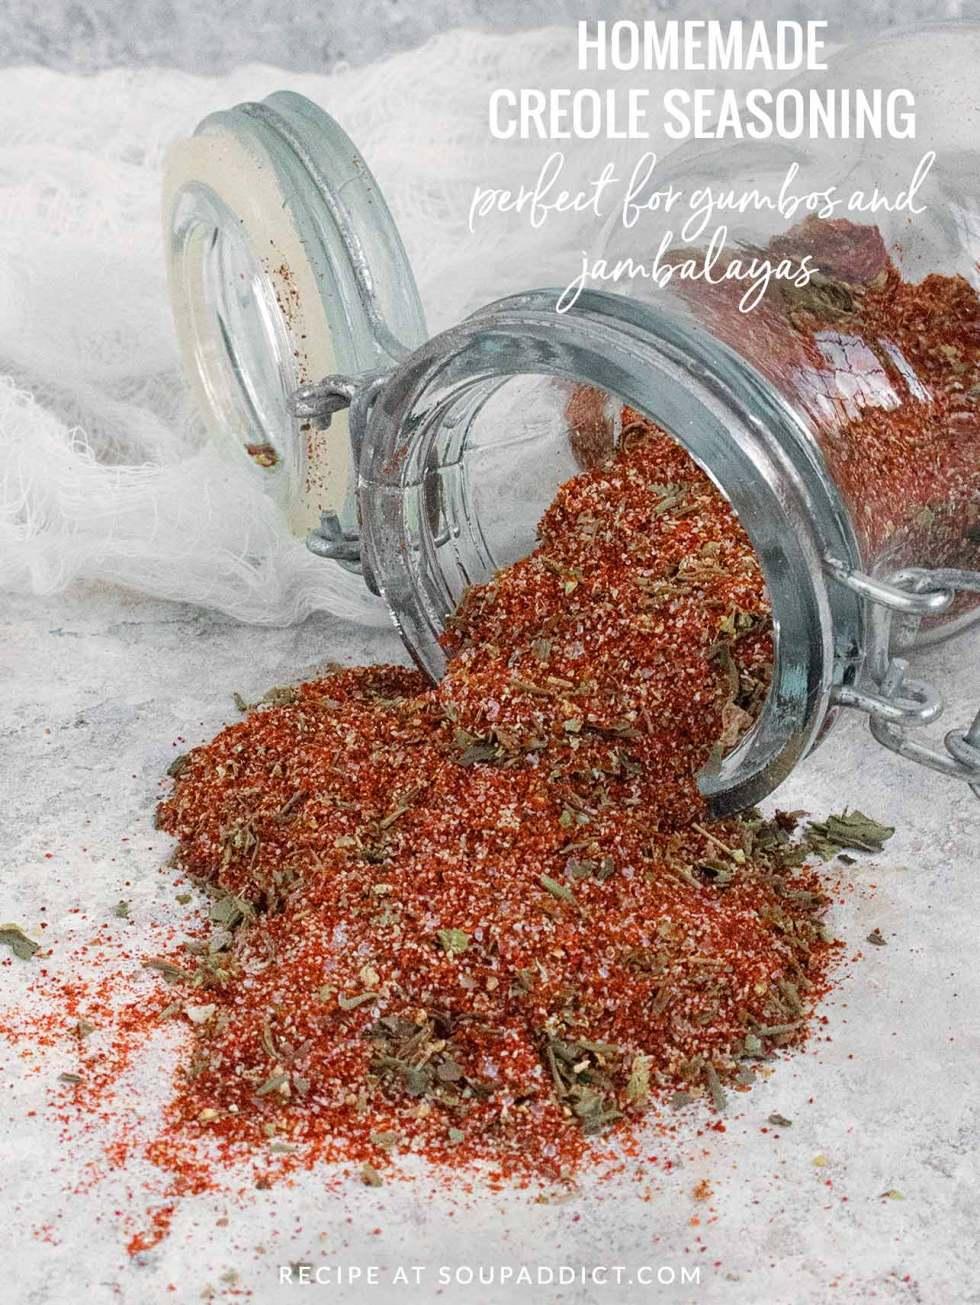 Creole Seasoning Spice Blend - Recipe at SoupAddict.com